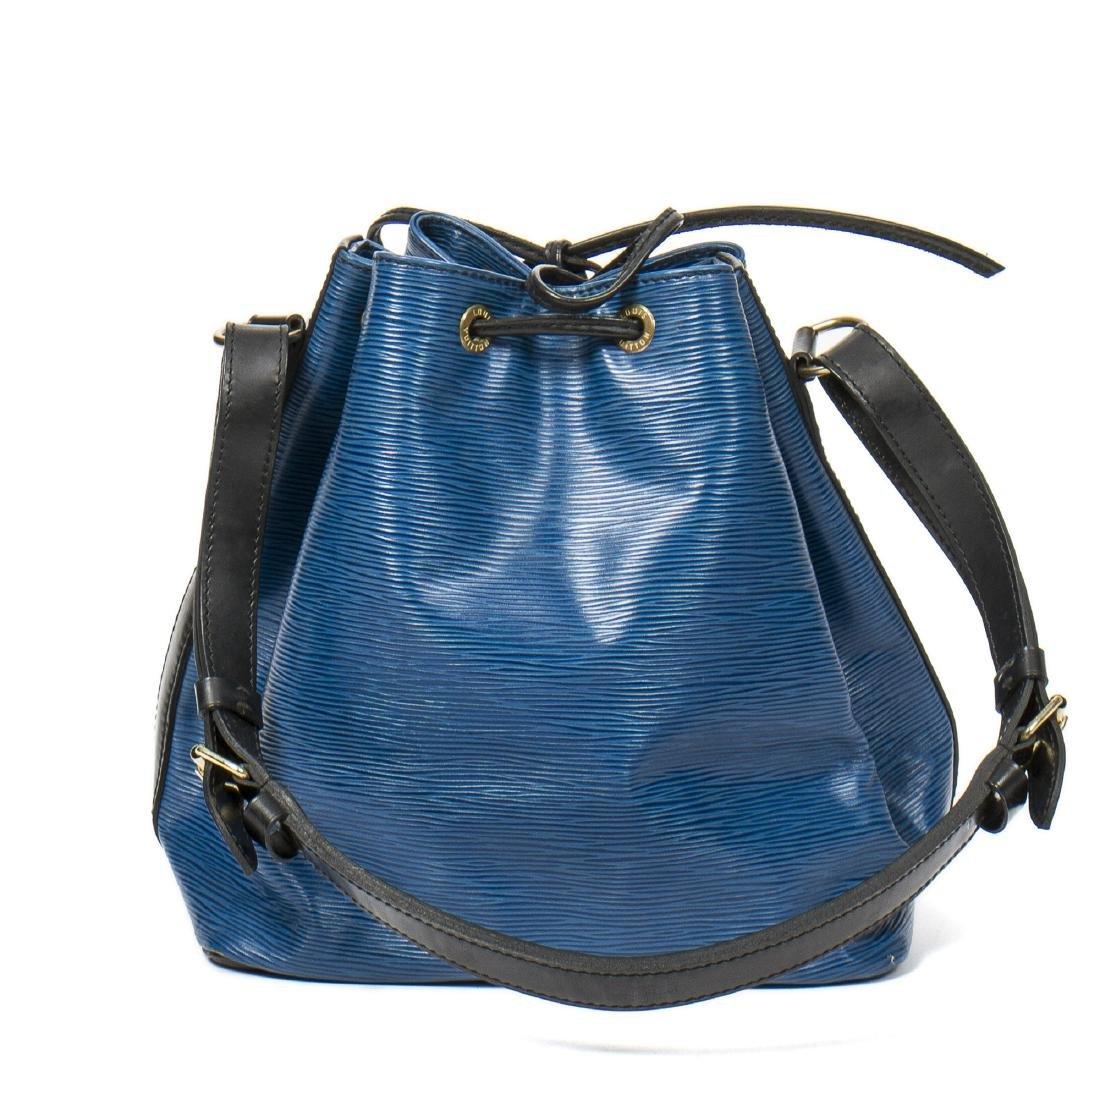 Louis Vuitton Noe Bicolor - 5